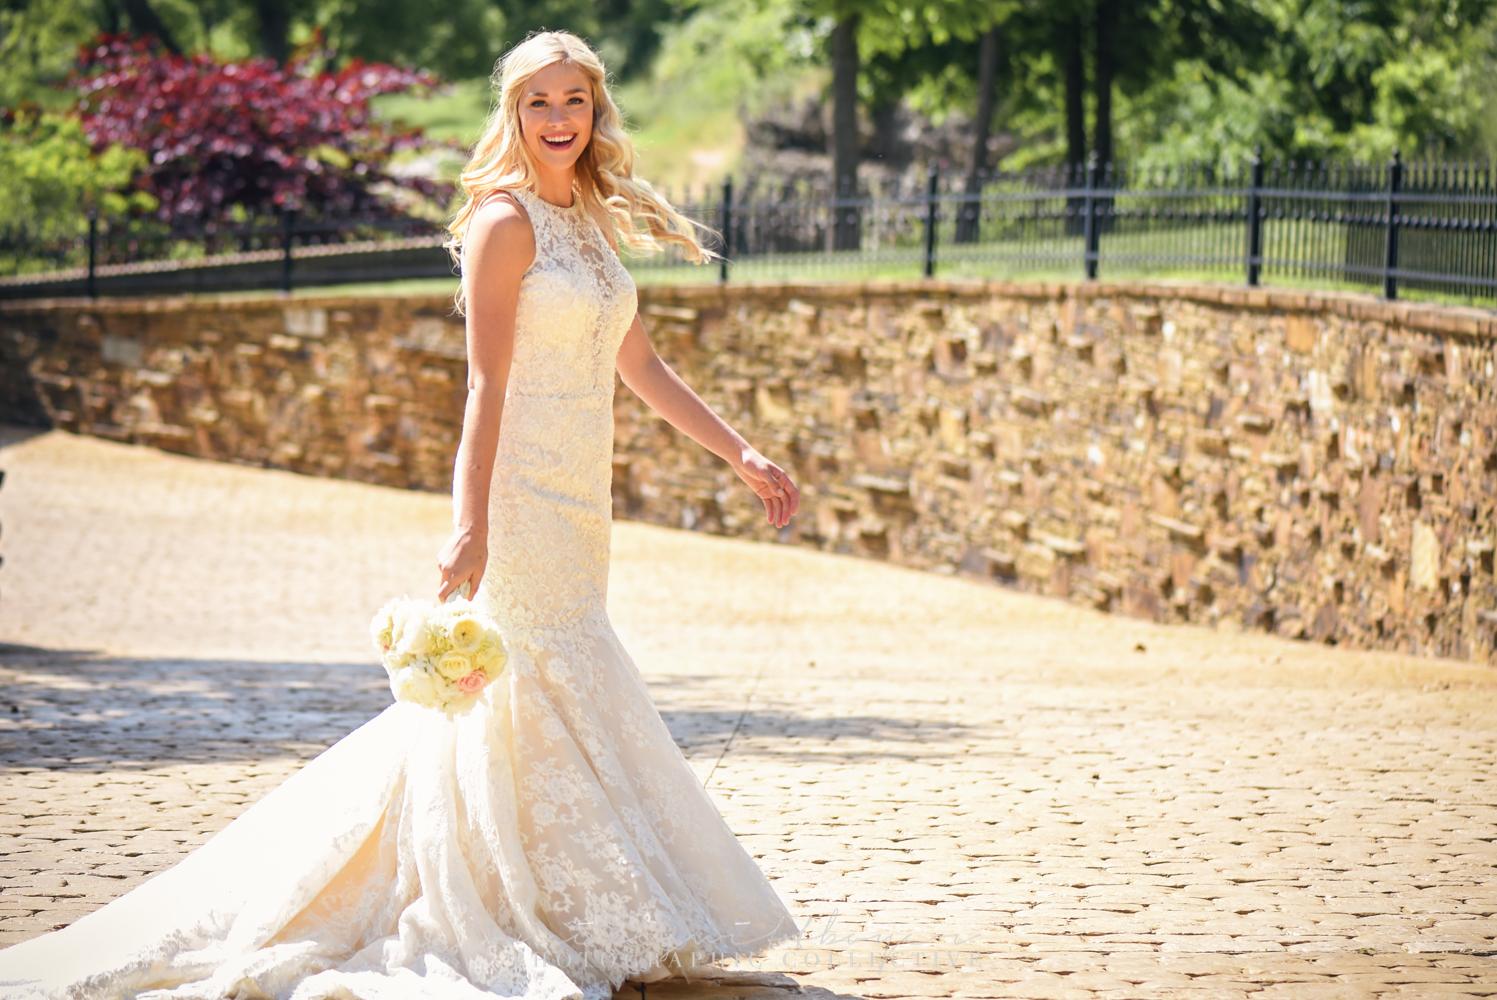 Calli.Berna.Bridals.Blog.2015.Mileswittboyer-12.jpg